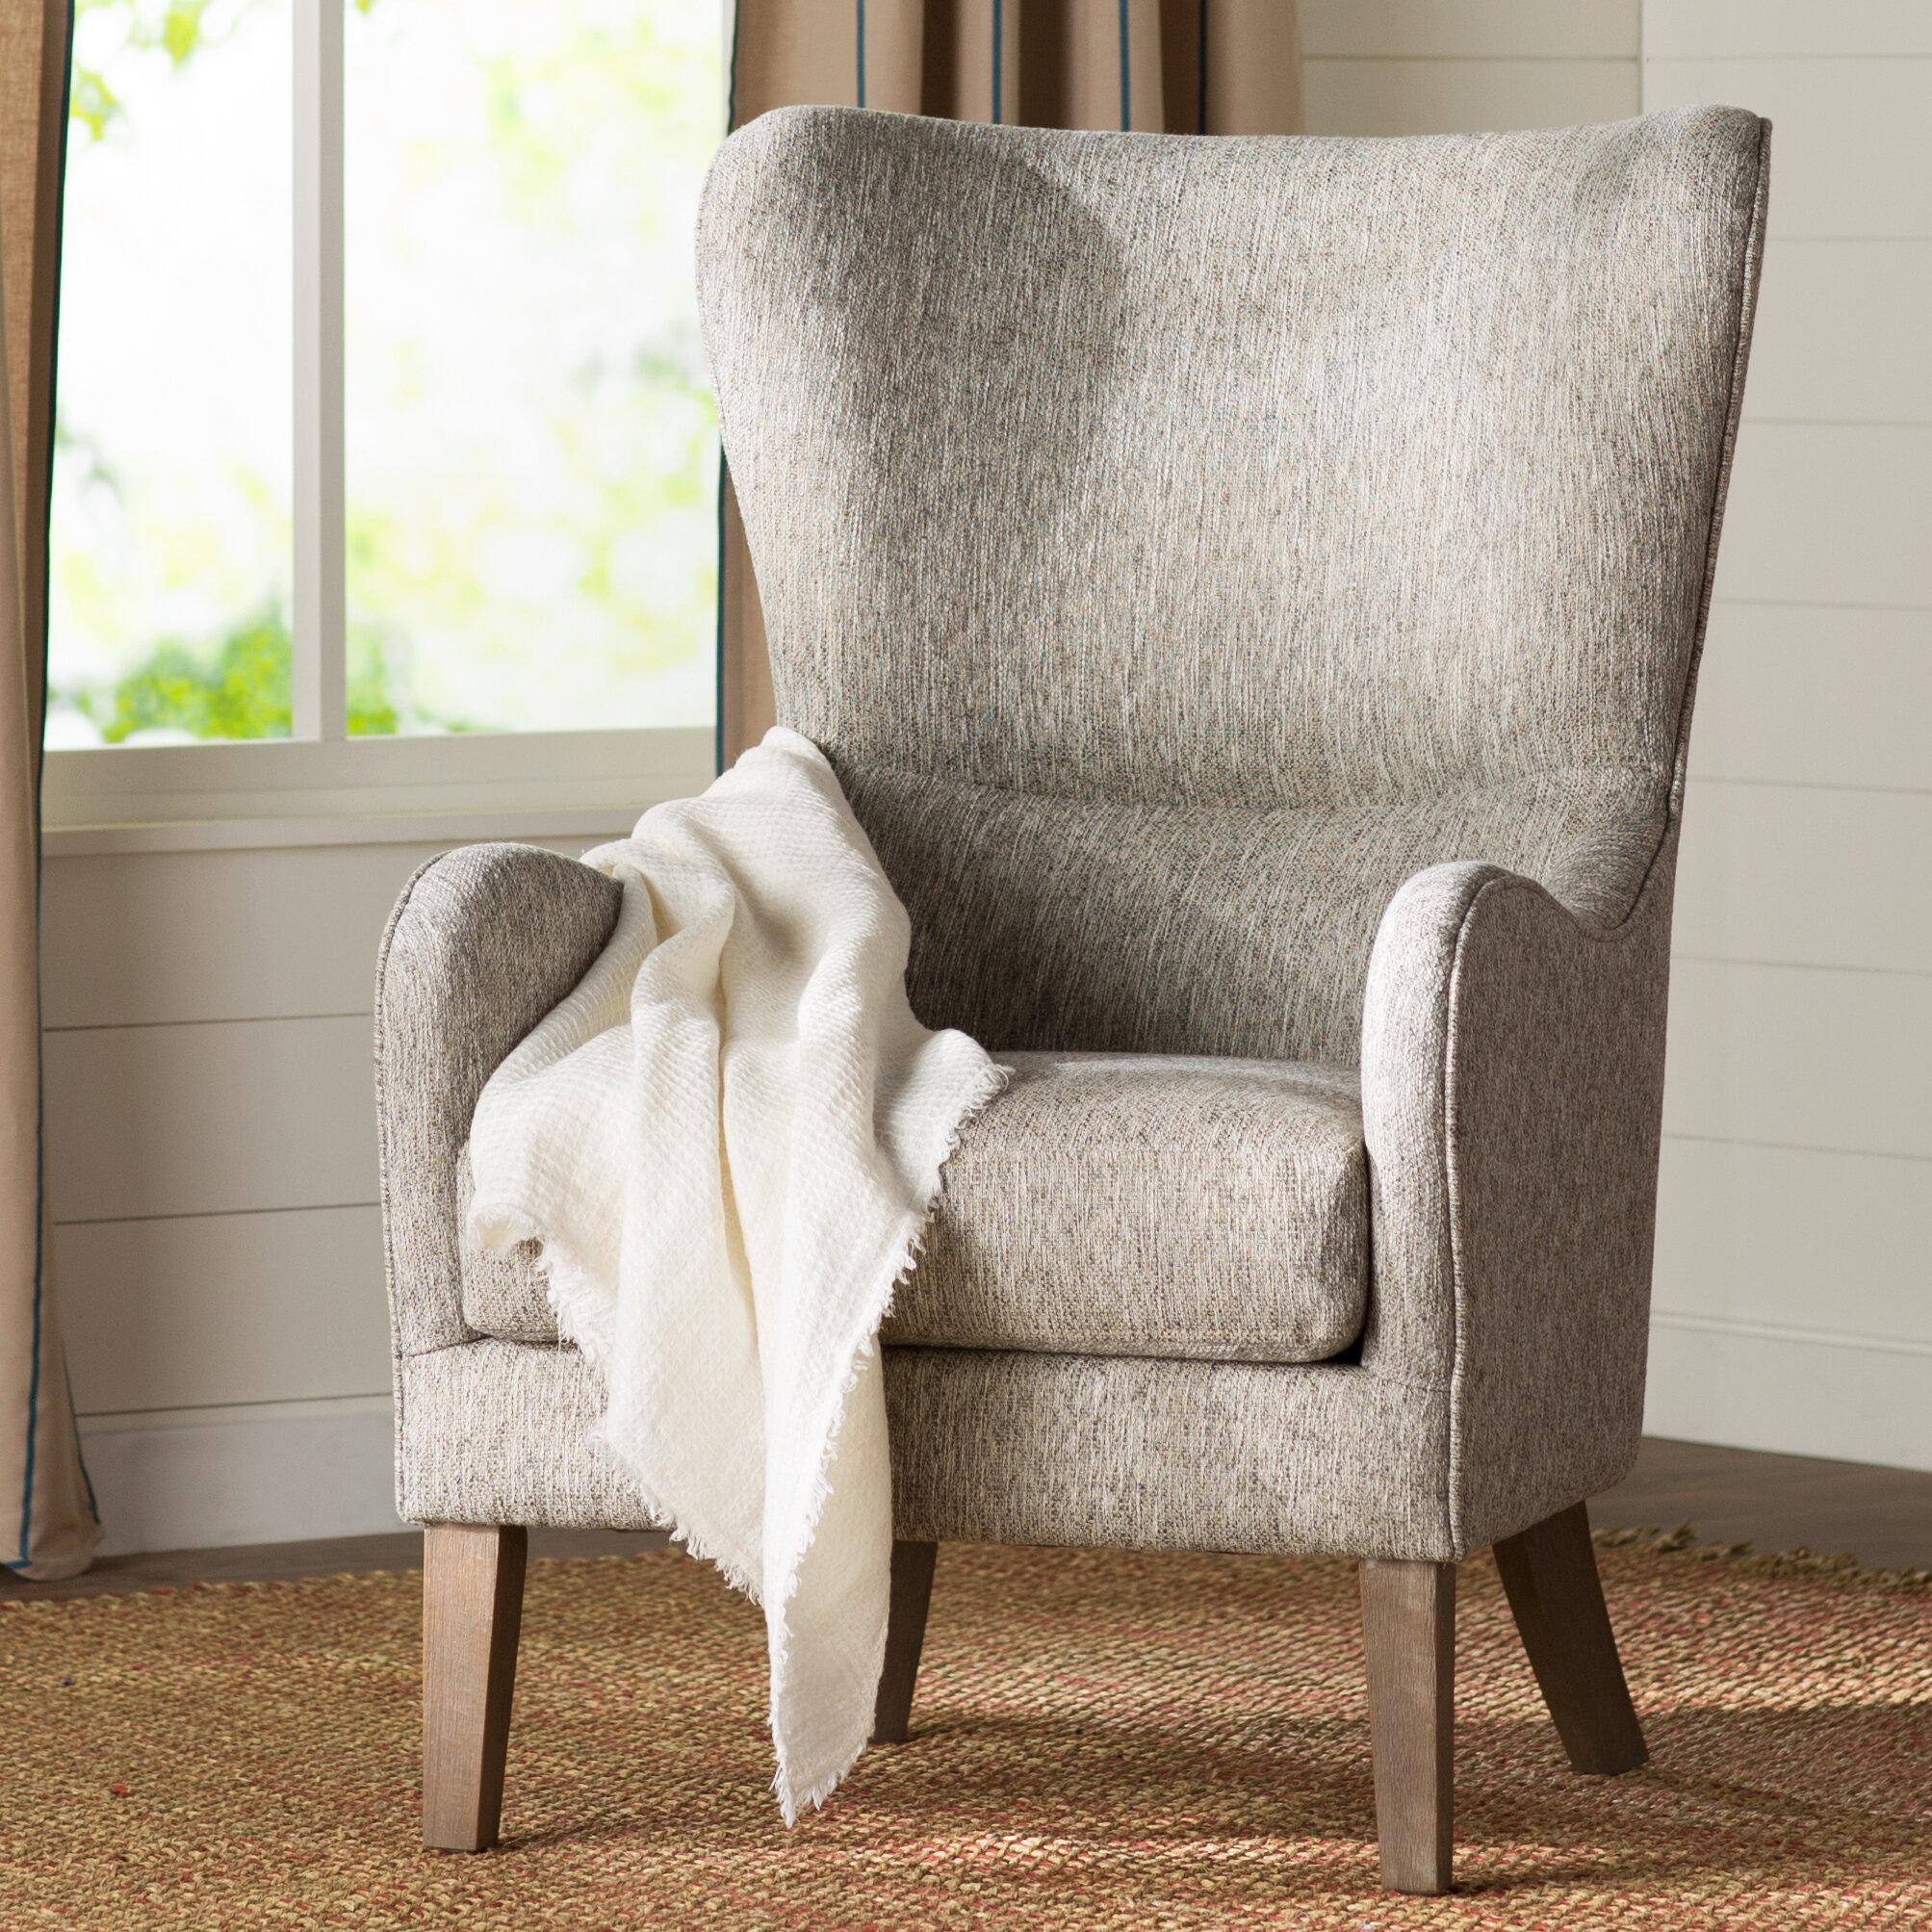 Laurel Foundry Modern Farmhouse Granville Swoop Wingback Chair U0026 Reviews |  Wayfair